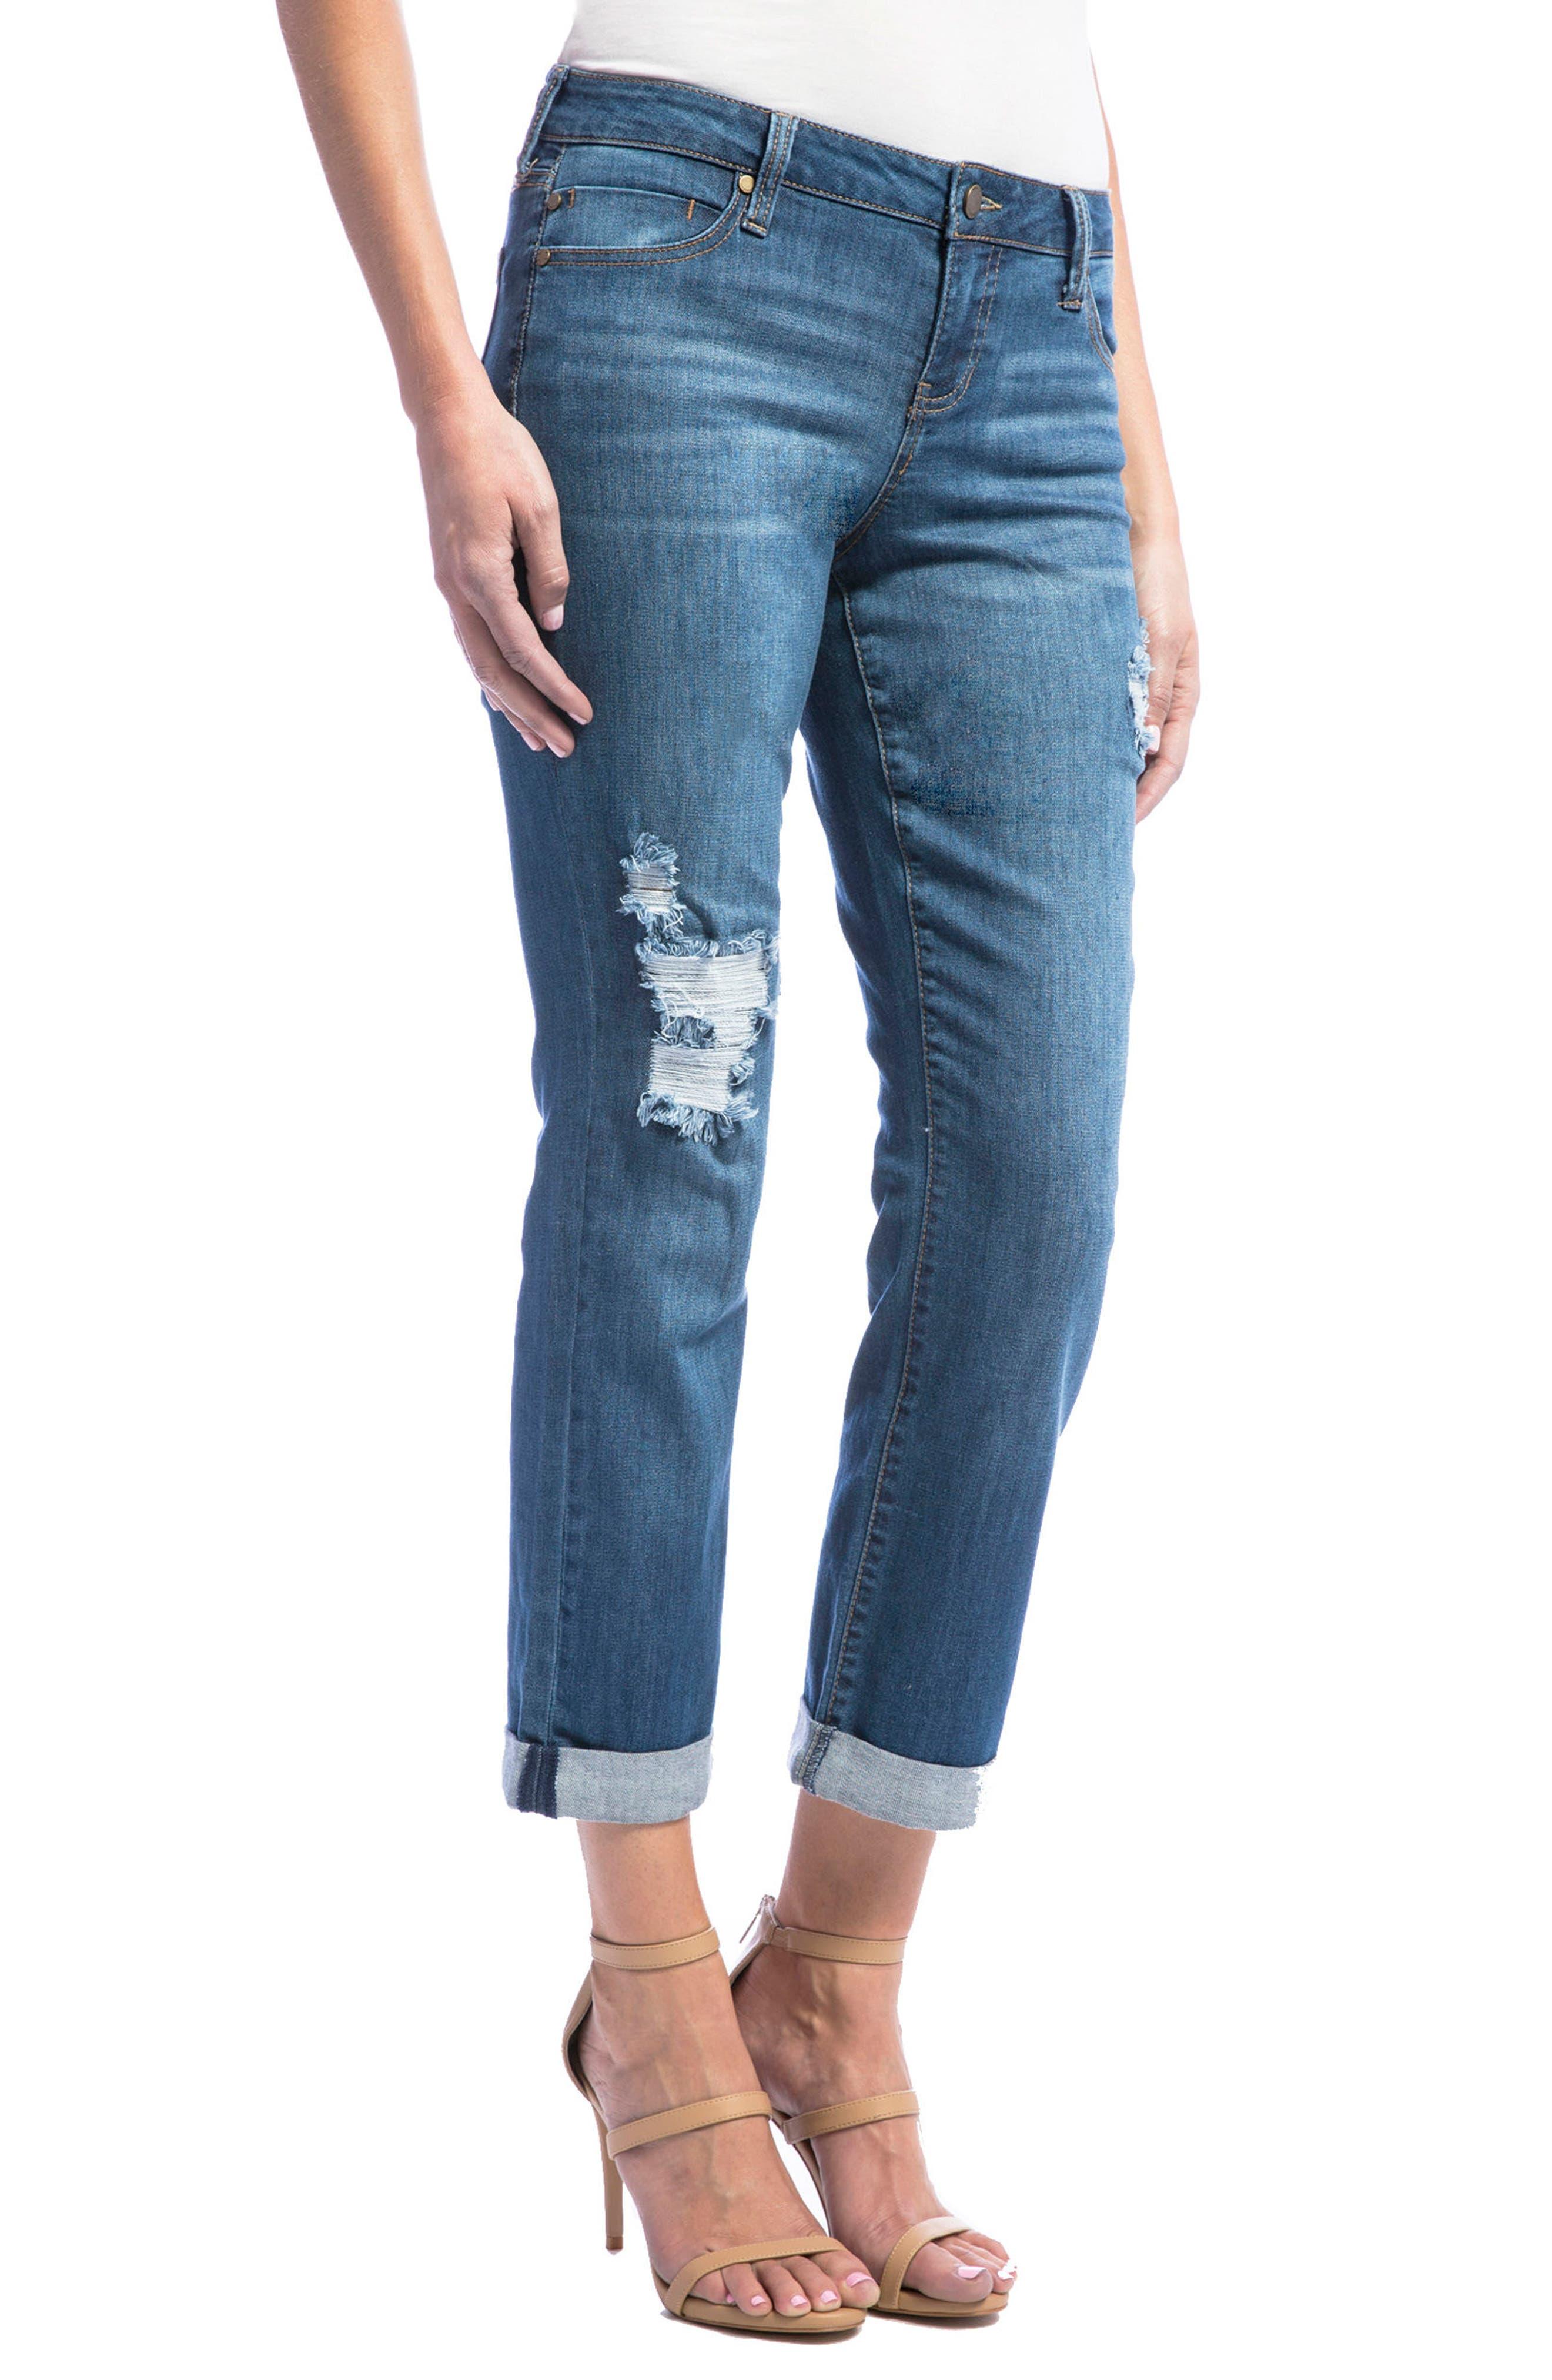 Jeans Company Peyton Slim Stretch Crop Boyfriend Jeans,                             Alternate thumbnail 3, color,                             Montauk Mid/ Destruction